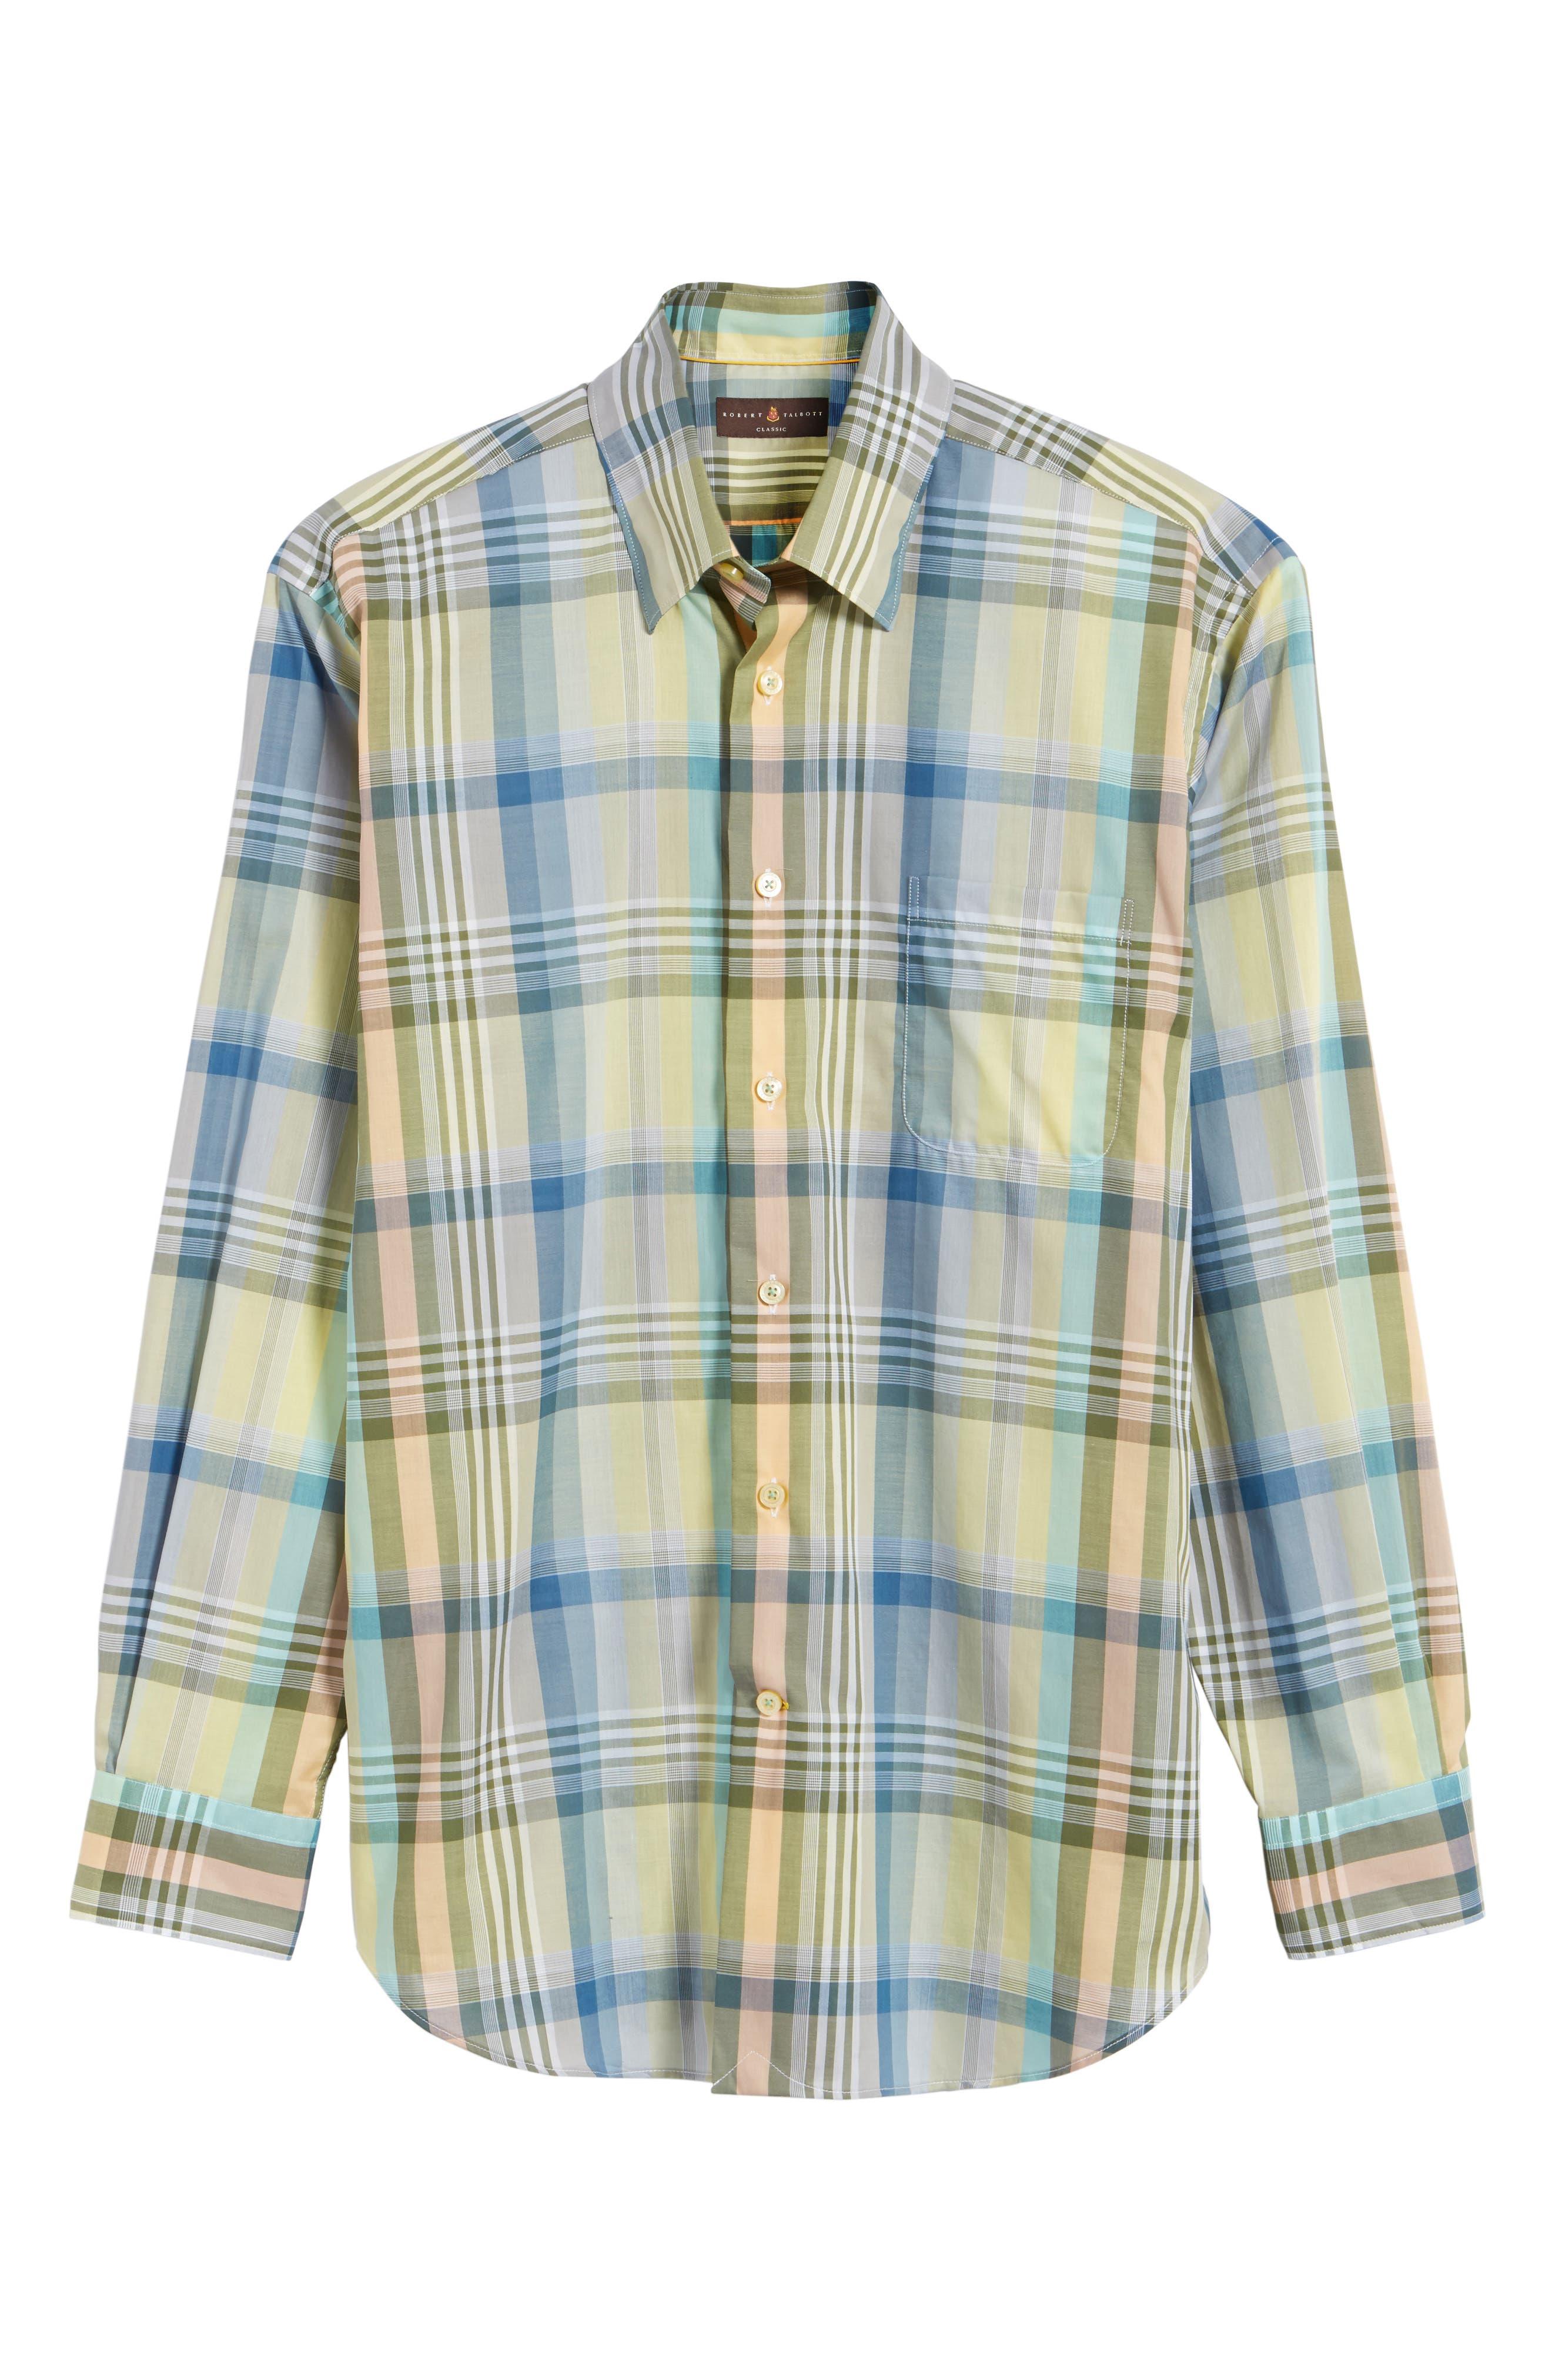 Anderson Classic Fit Plaid Sport Shirt,                             Alternate thumbnail 6, color,                             960